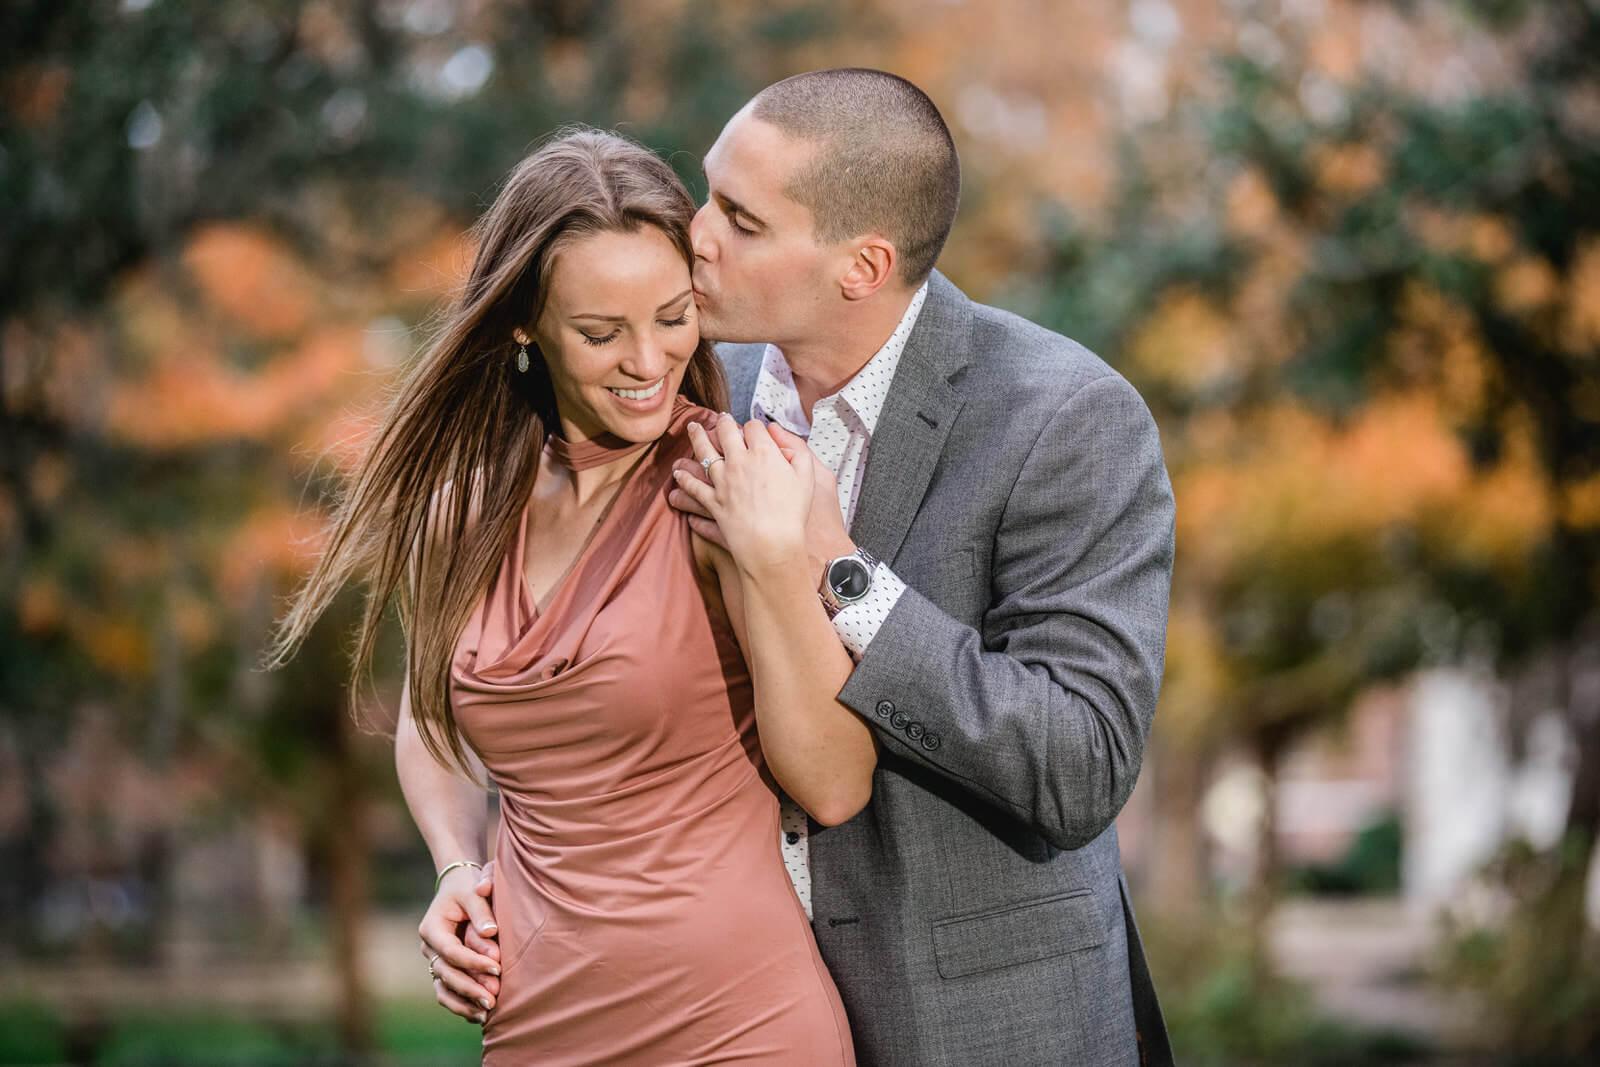 Engagement photographer near me in Charleston